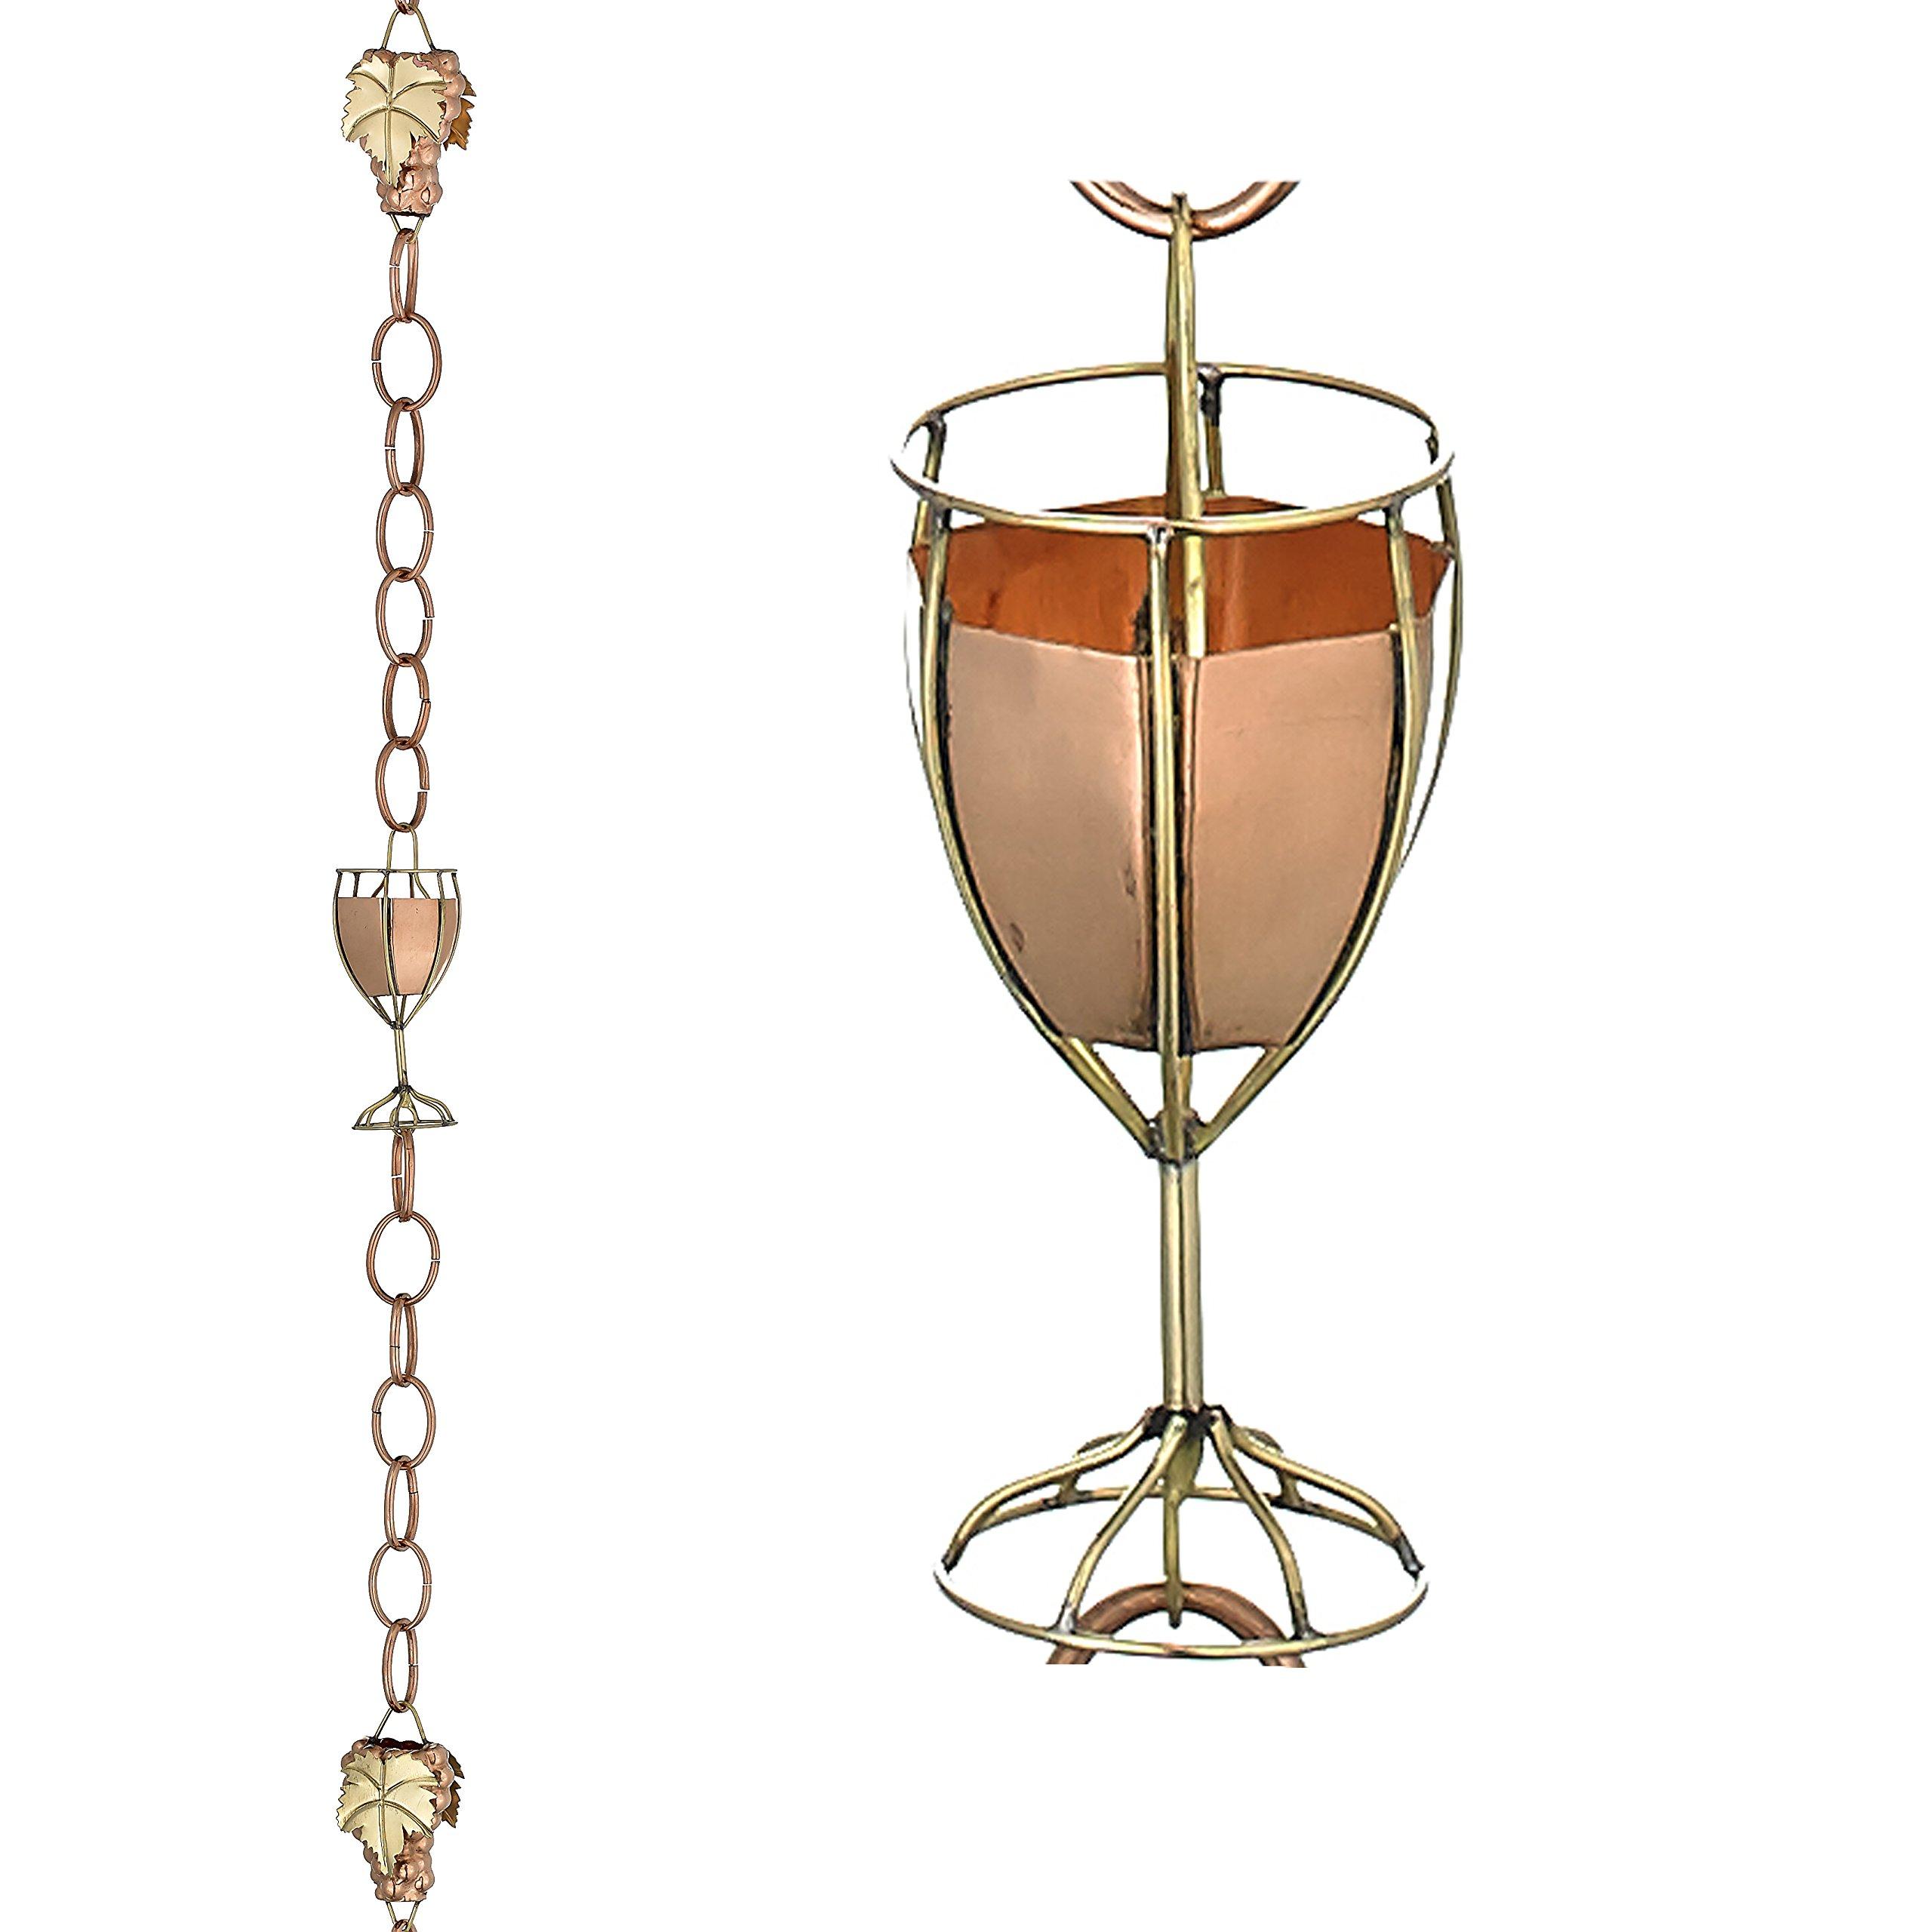 Good Directions Wine and Glasses Pure Copper 8.5-Foot Rain Chain